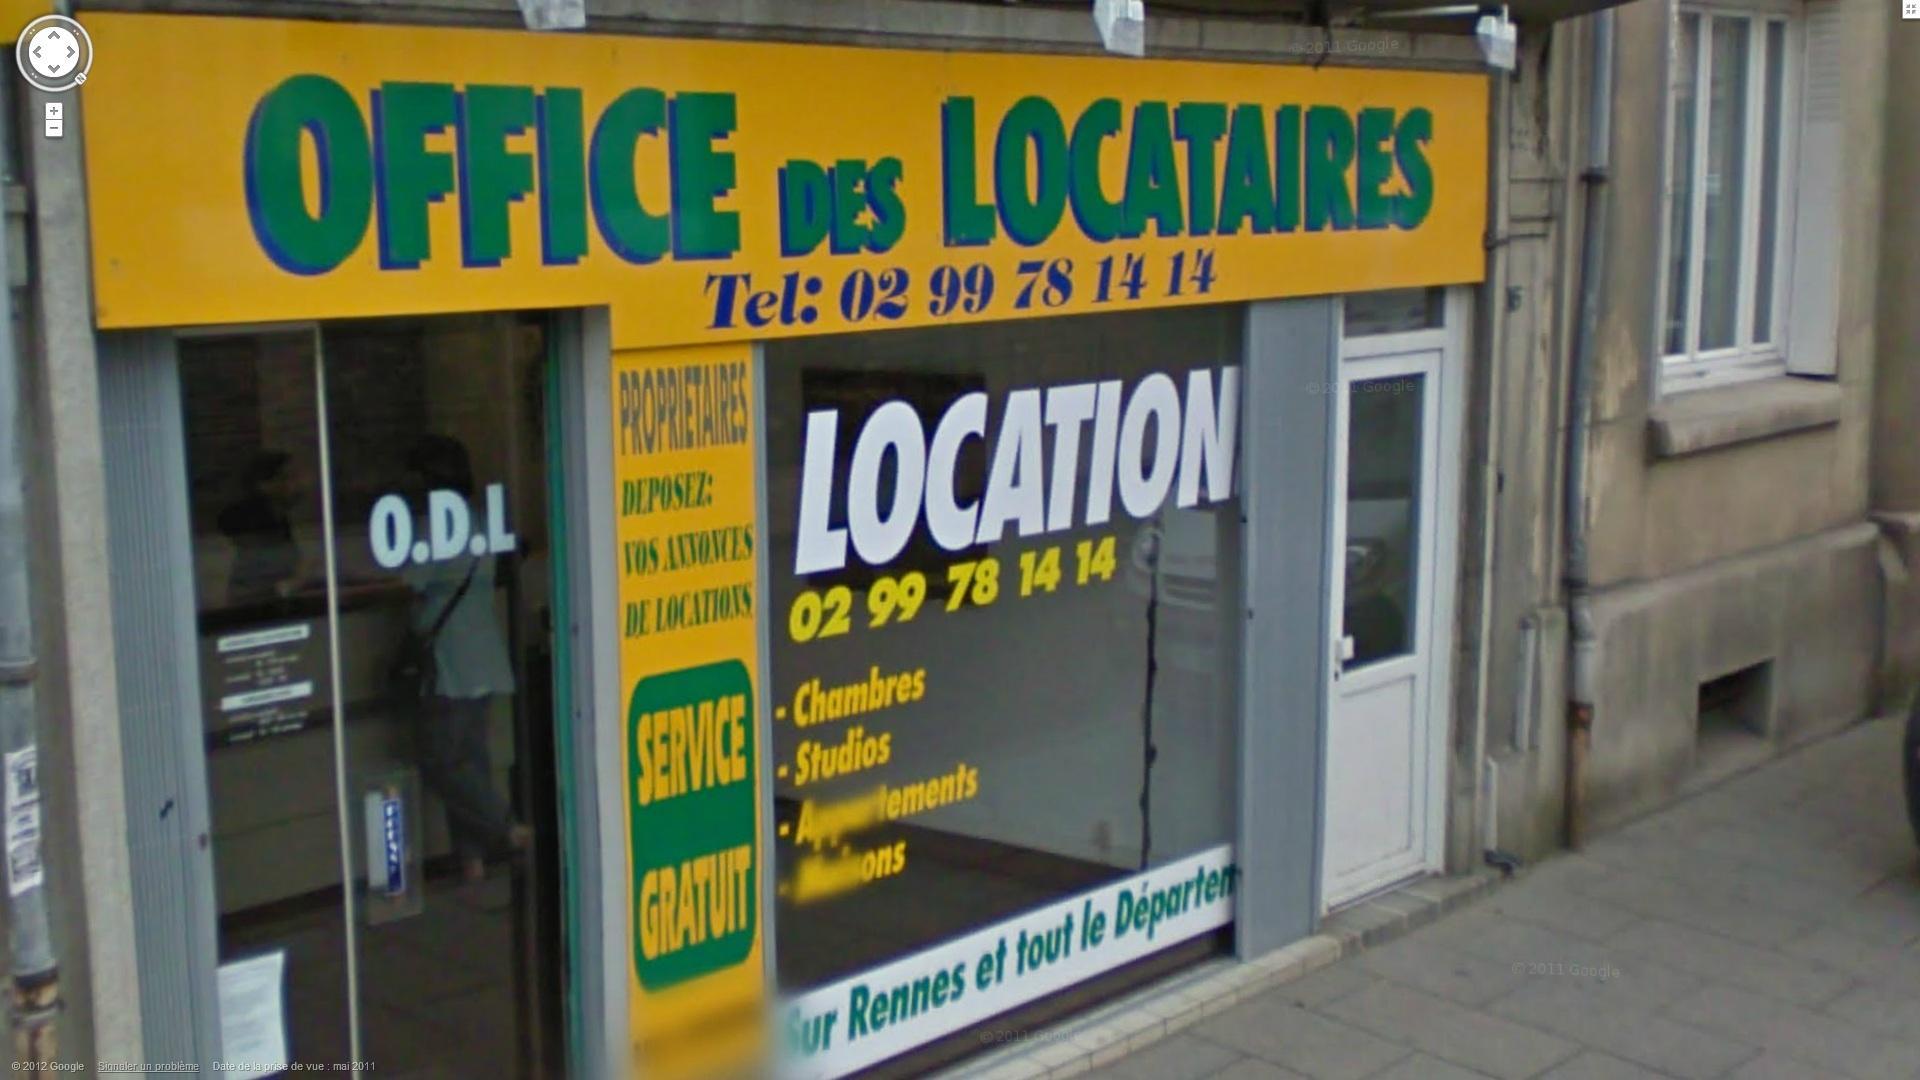 Avis office des locataires rennes monaviscompte - Office des locataires toulouse ...